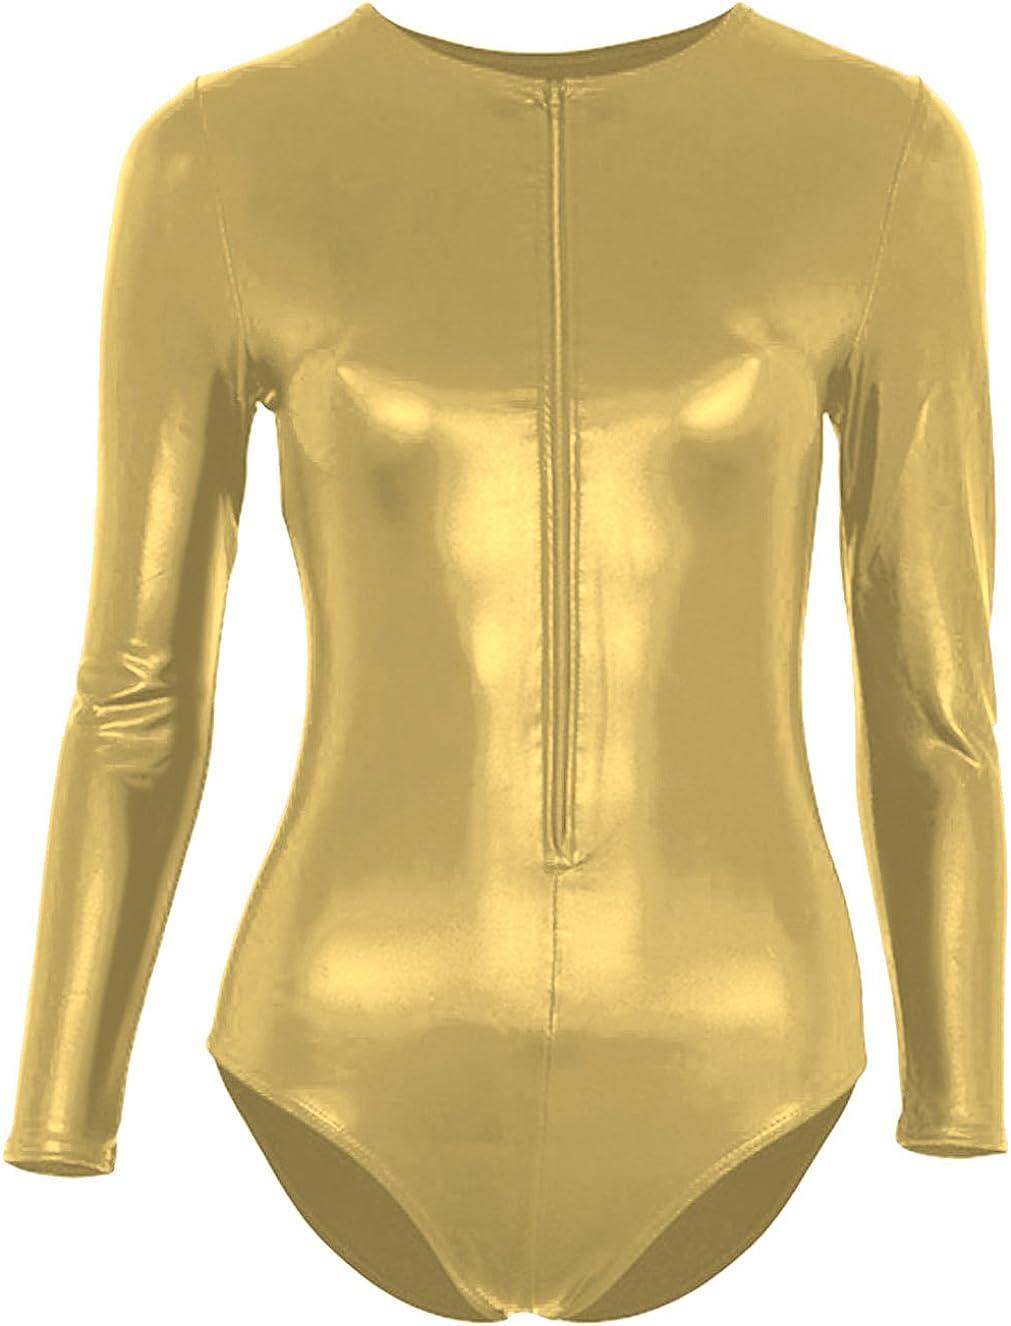 Sheface Women's Shiny Long Sleeve Bodysuit Zipped Wetlook Dance Unitard